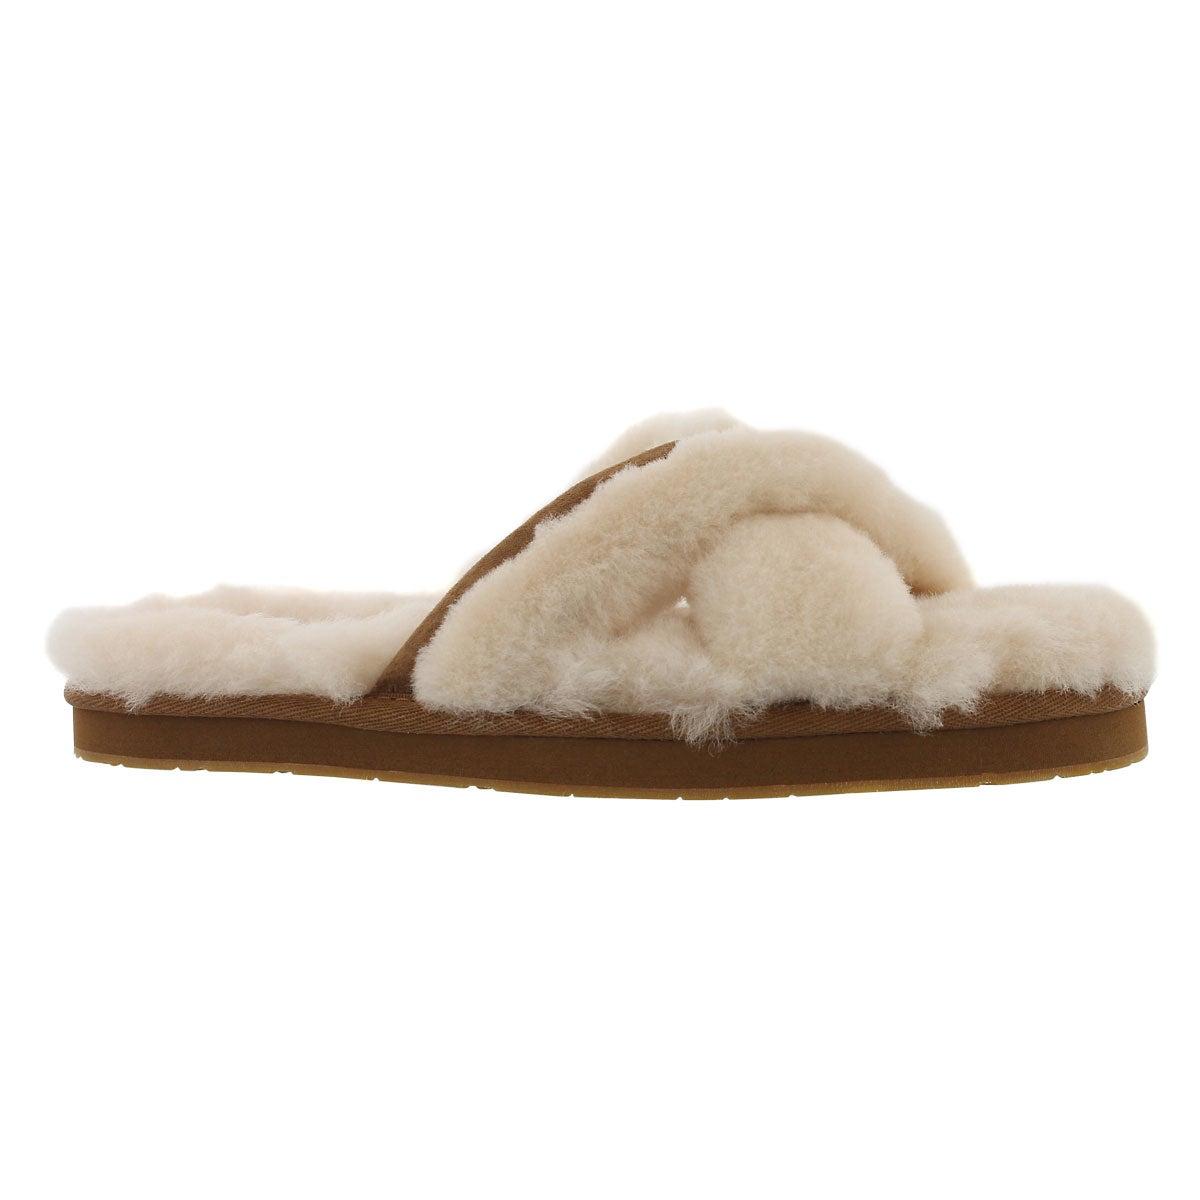 Lds Abela natural sheepskin slipper